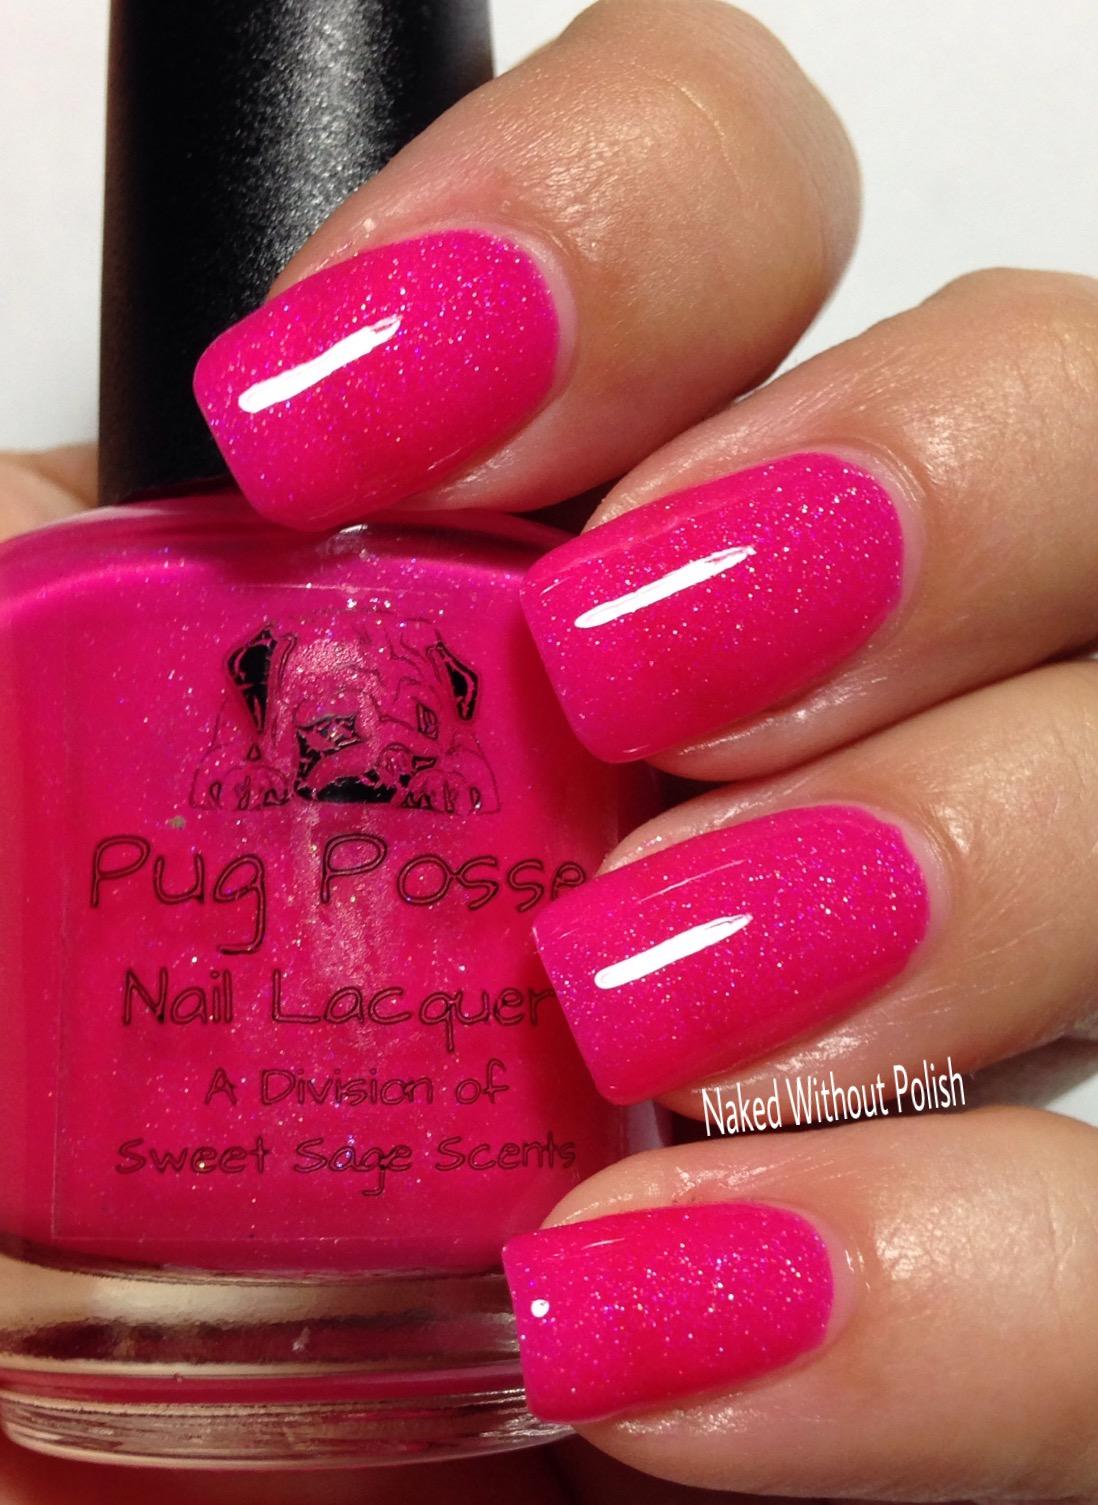 Pug-Posse-Nail-Lacquer-Risqué-11